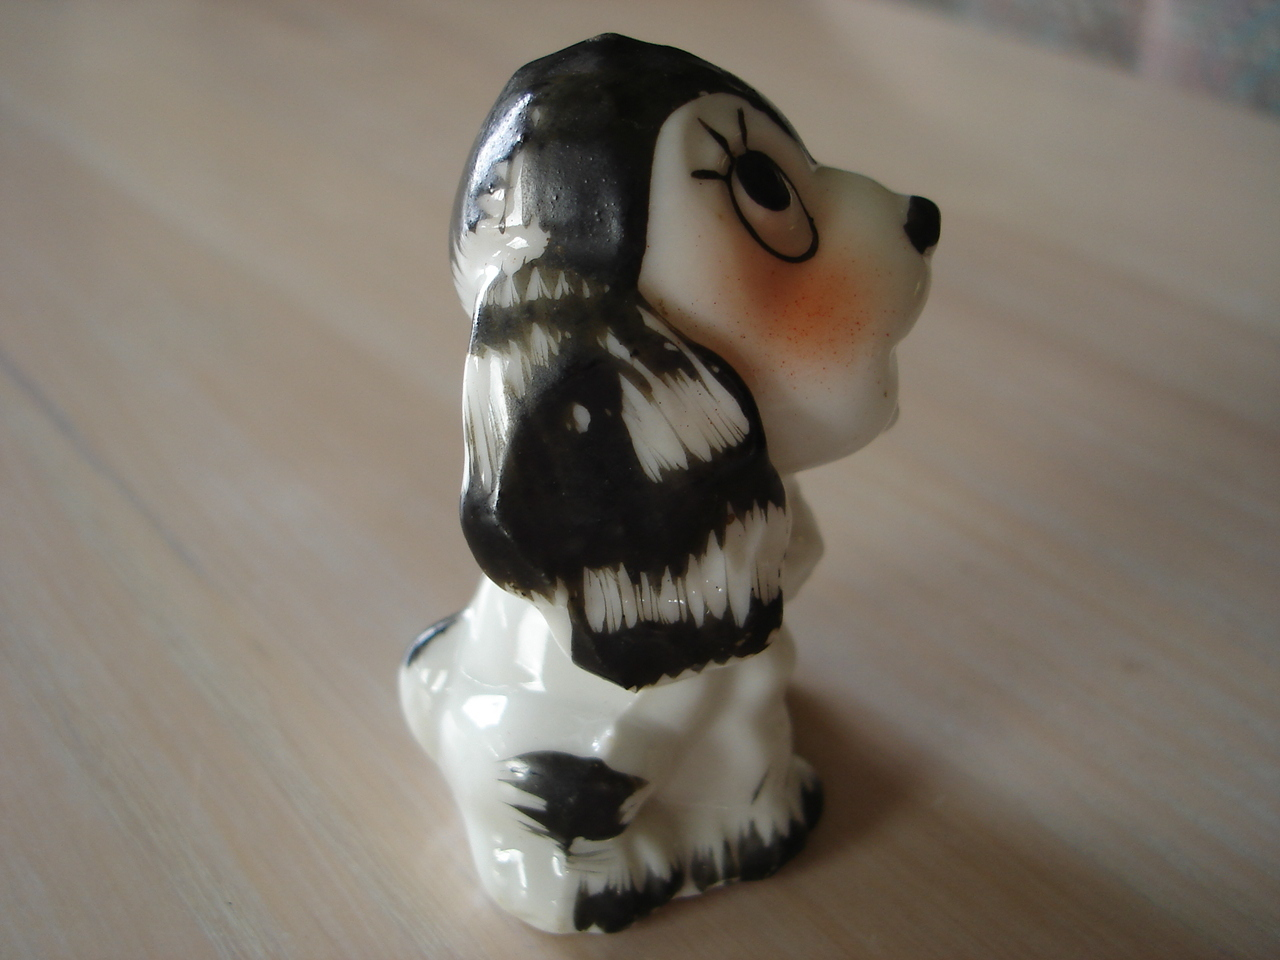 Vintage Porcelain White/blk Puppy Figurine, Occupied Japan